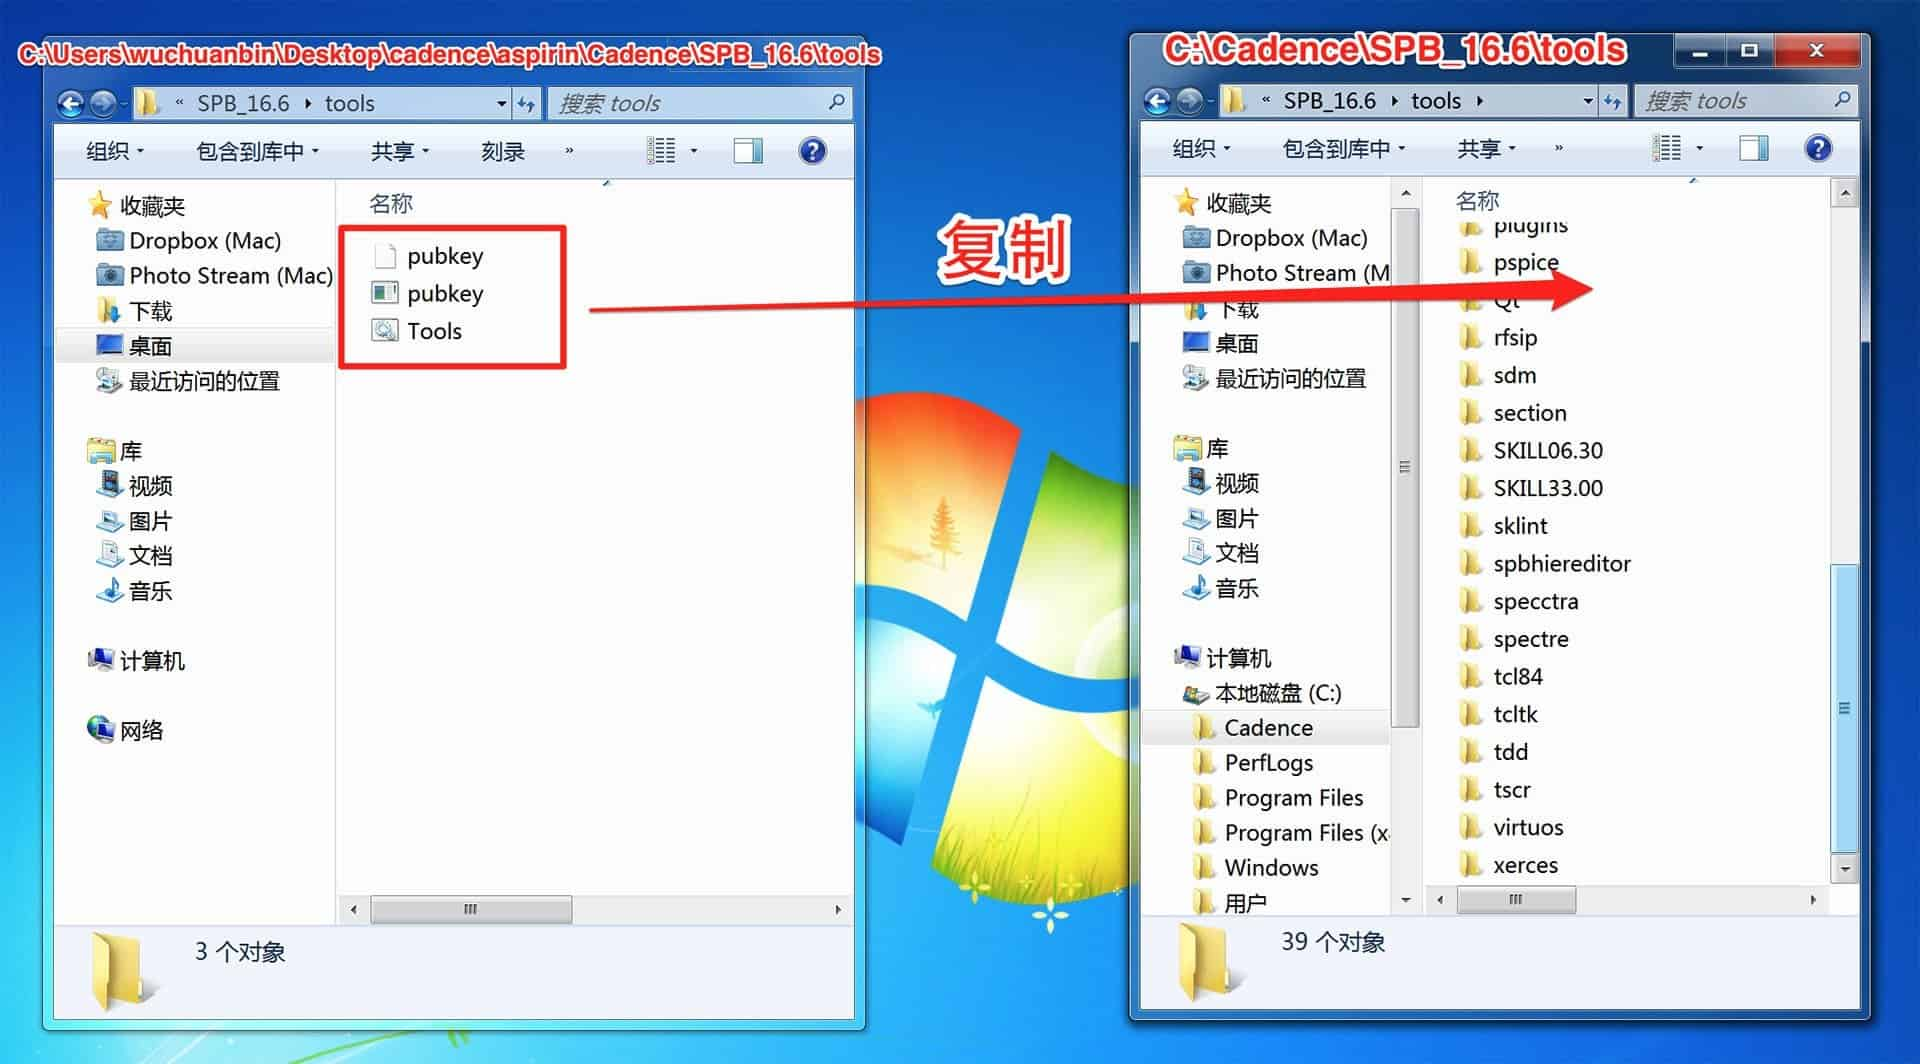 Cadence OrCad Allegro SPB 16.6 下载及安装破解指南-16